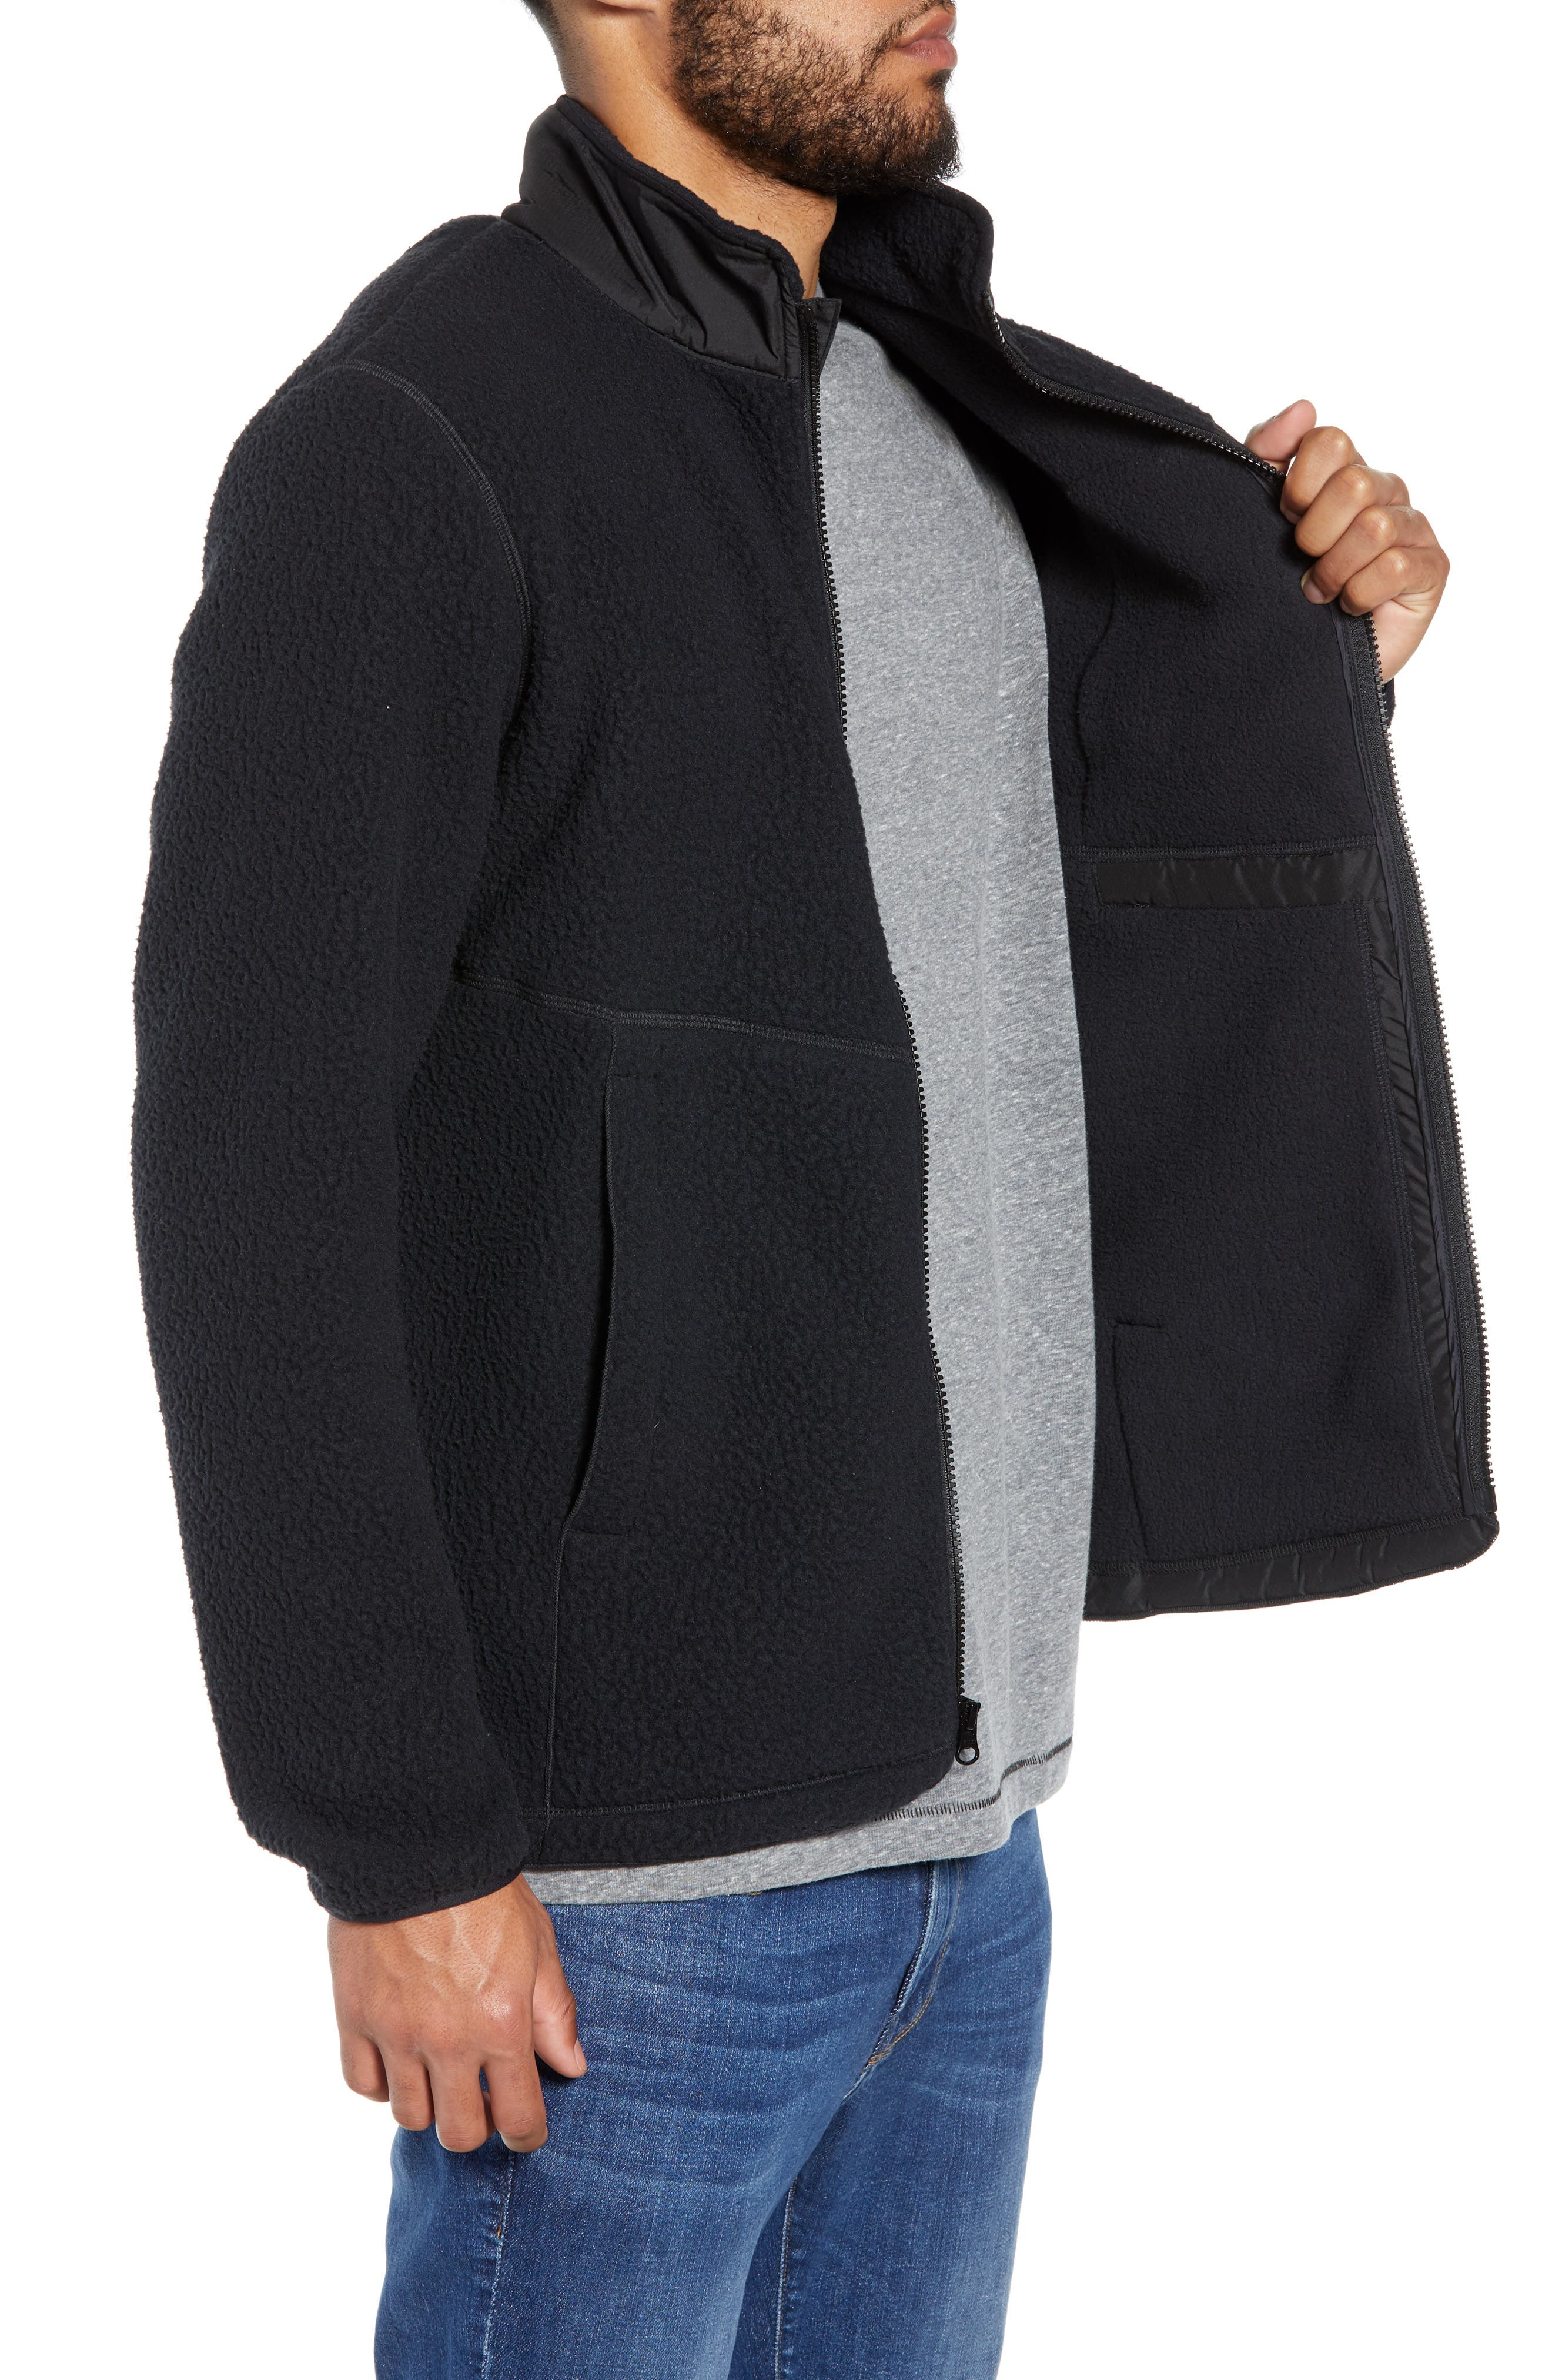 HERSCHEL SUPPLY CO.,                             Tech Fleece Jacket,                             Alternate thumbnail 3, color,                             001